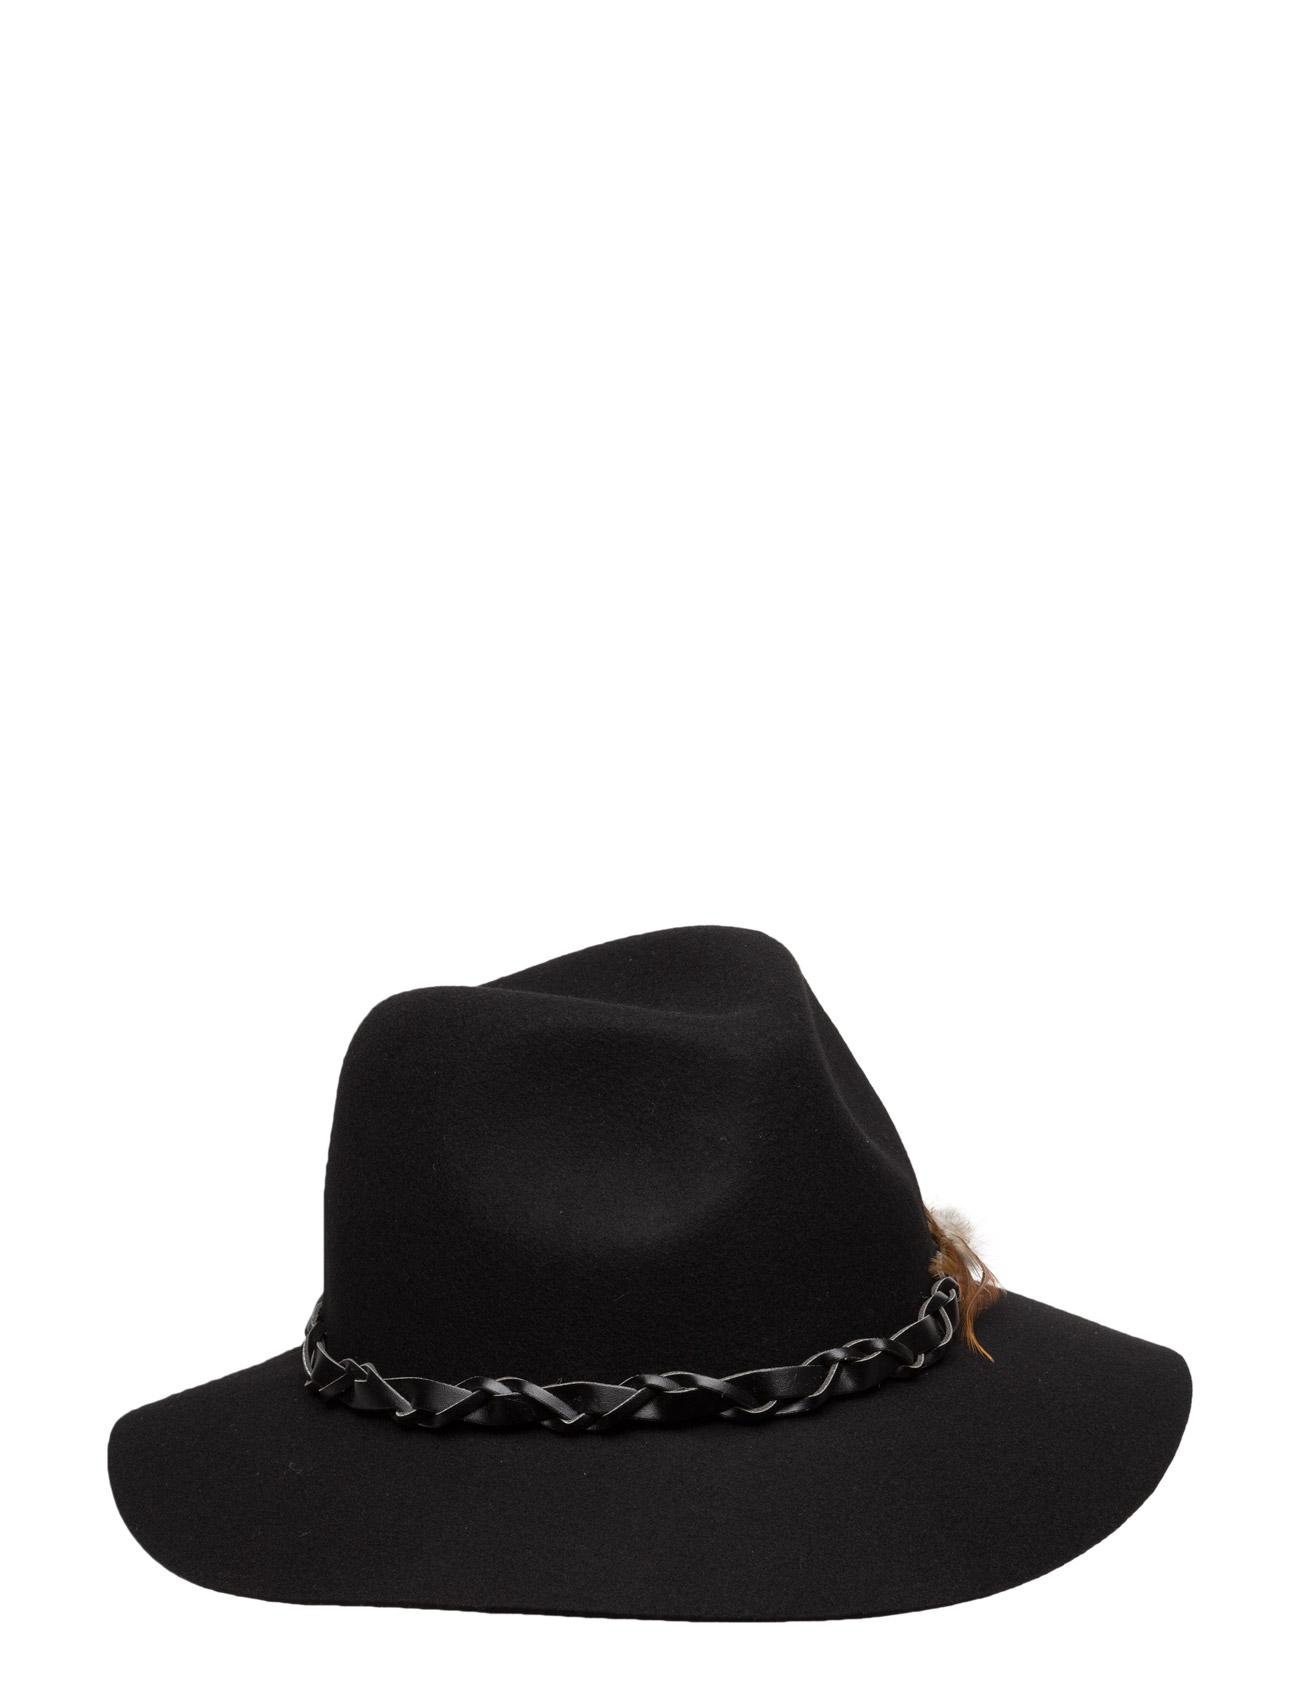 Felt Hat W. Feathers UNMADE Copenhagen Hatte & Caps til Damer i